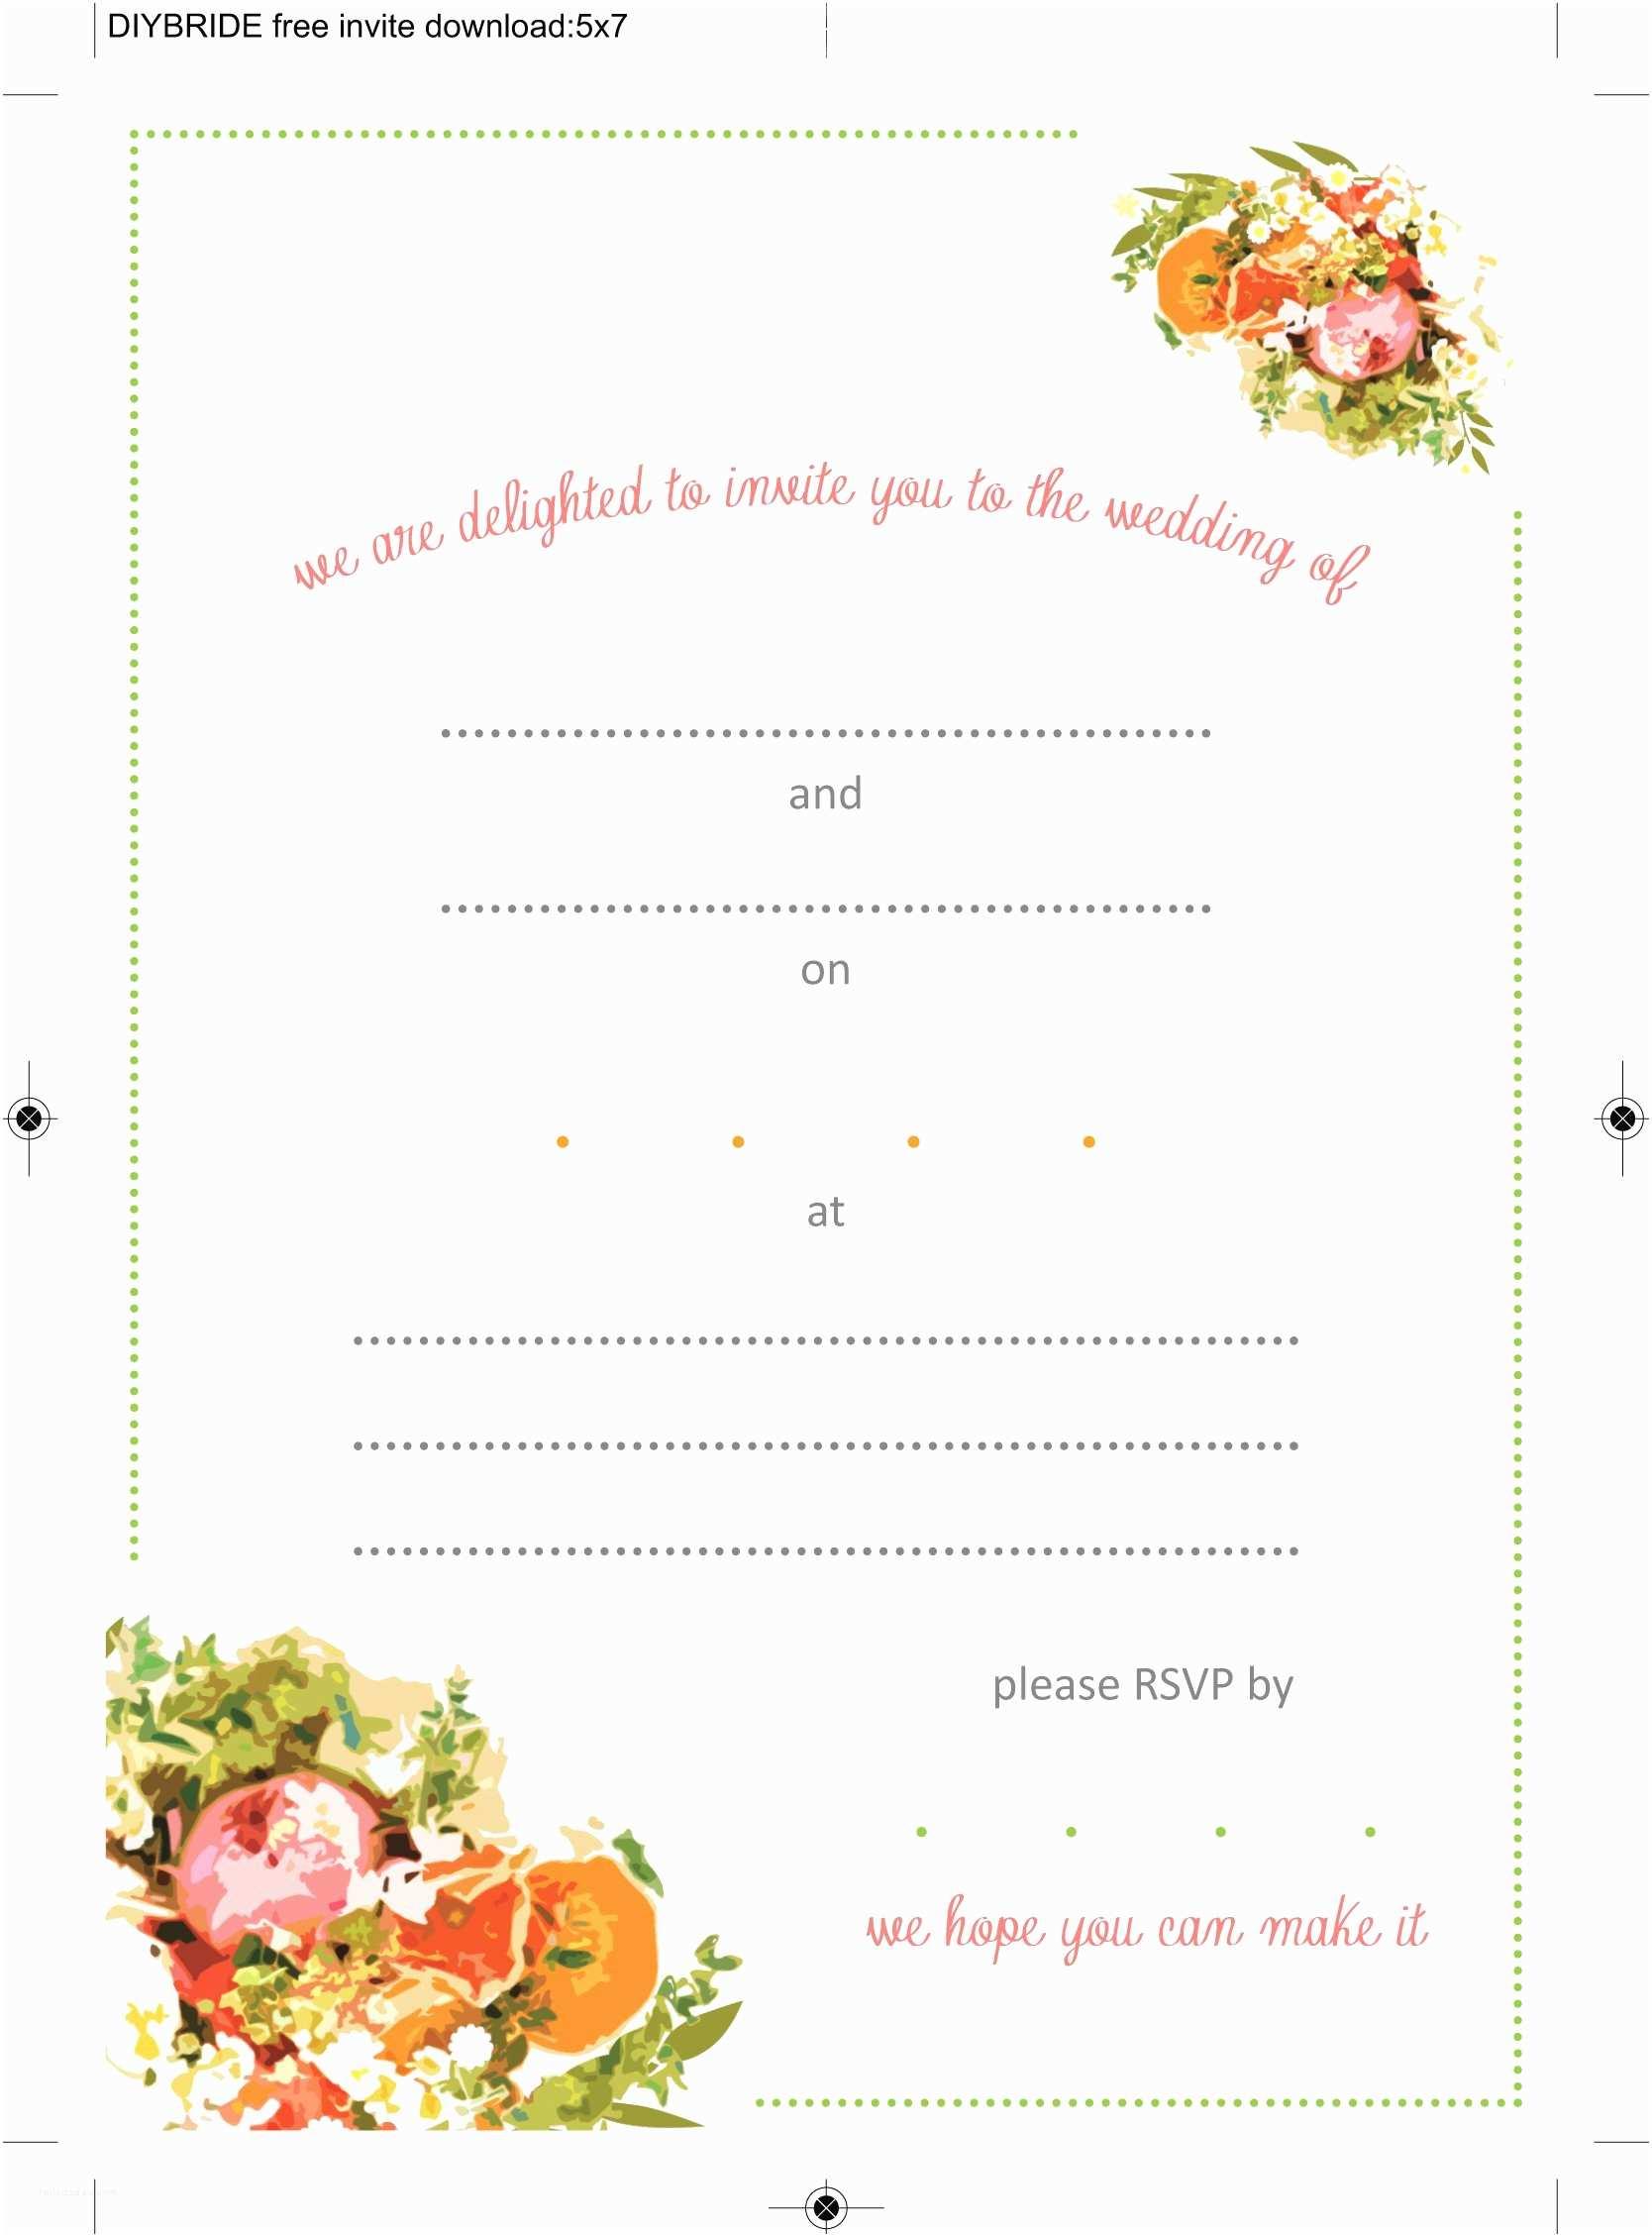 Free Printable Wedding Invitation Templates Free Printable Wedding Invitation Templates Download